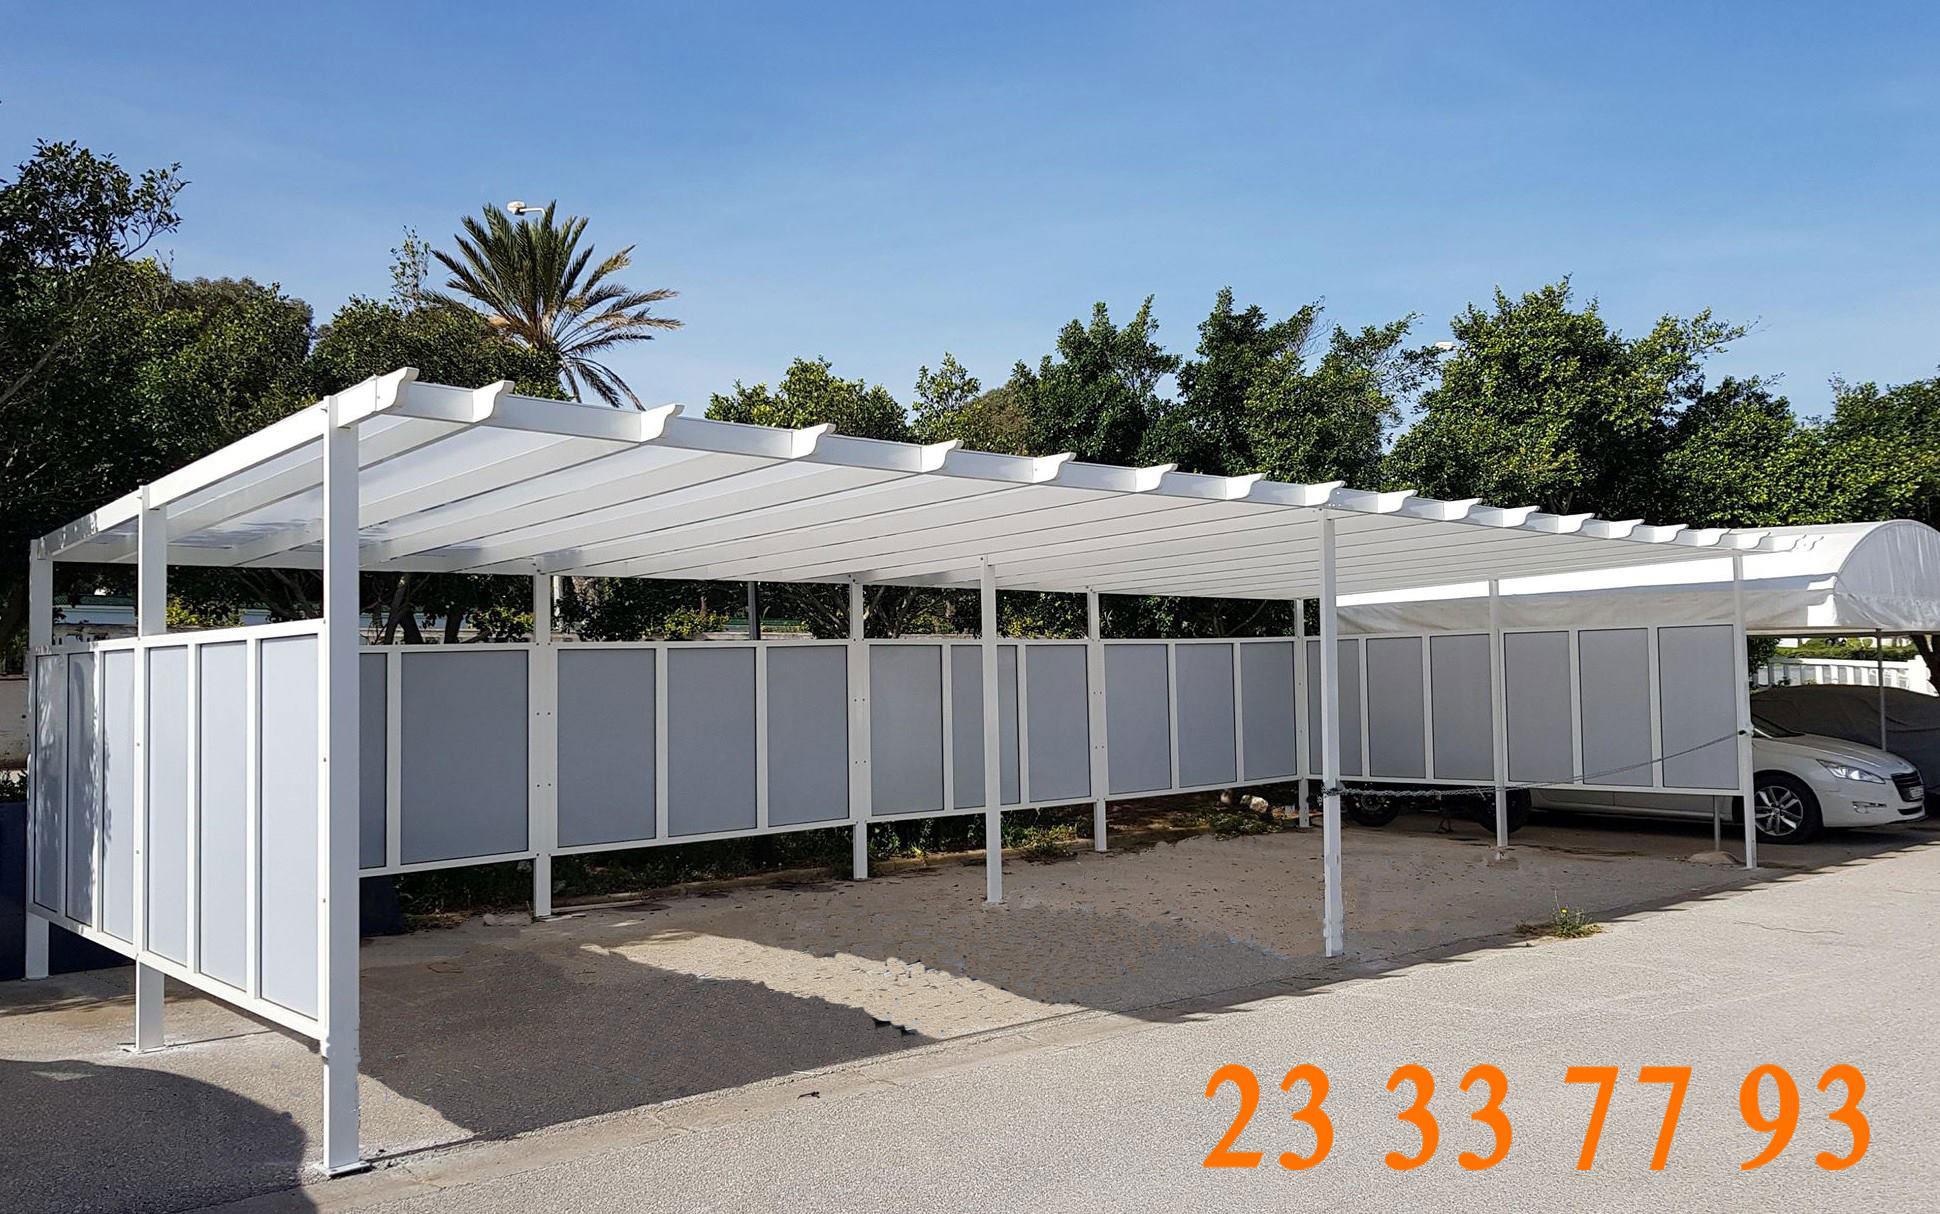 Abri Voiture - Alumetal Mezghani avec Abri De Jardin Tunisie